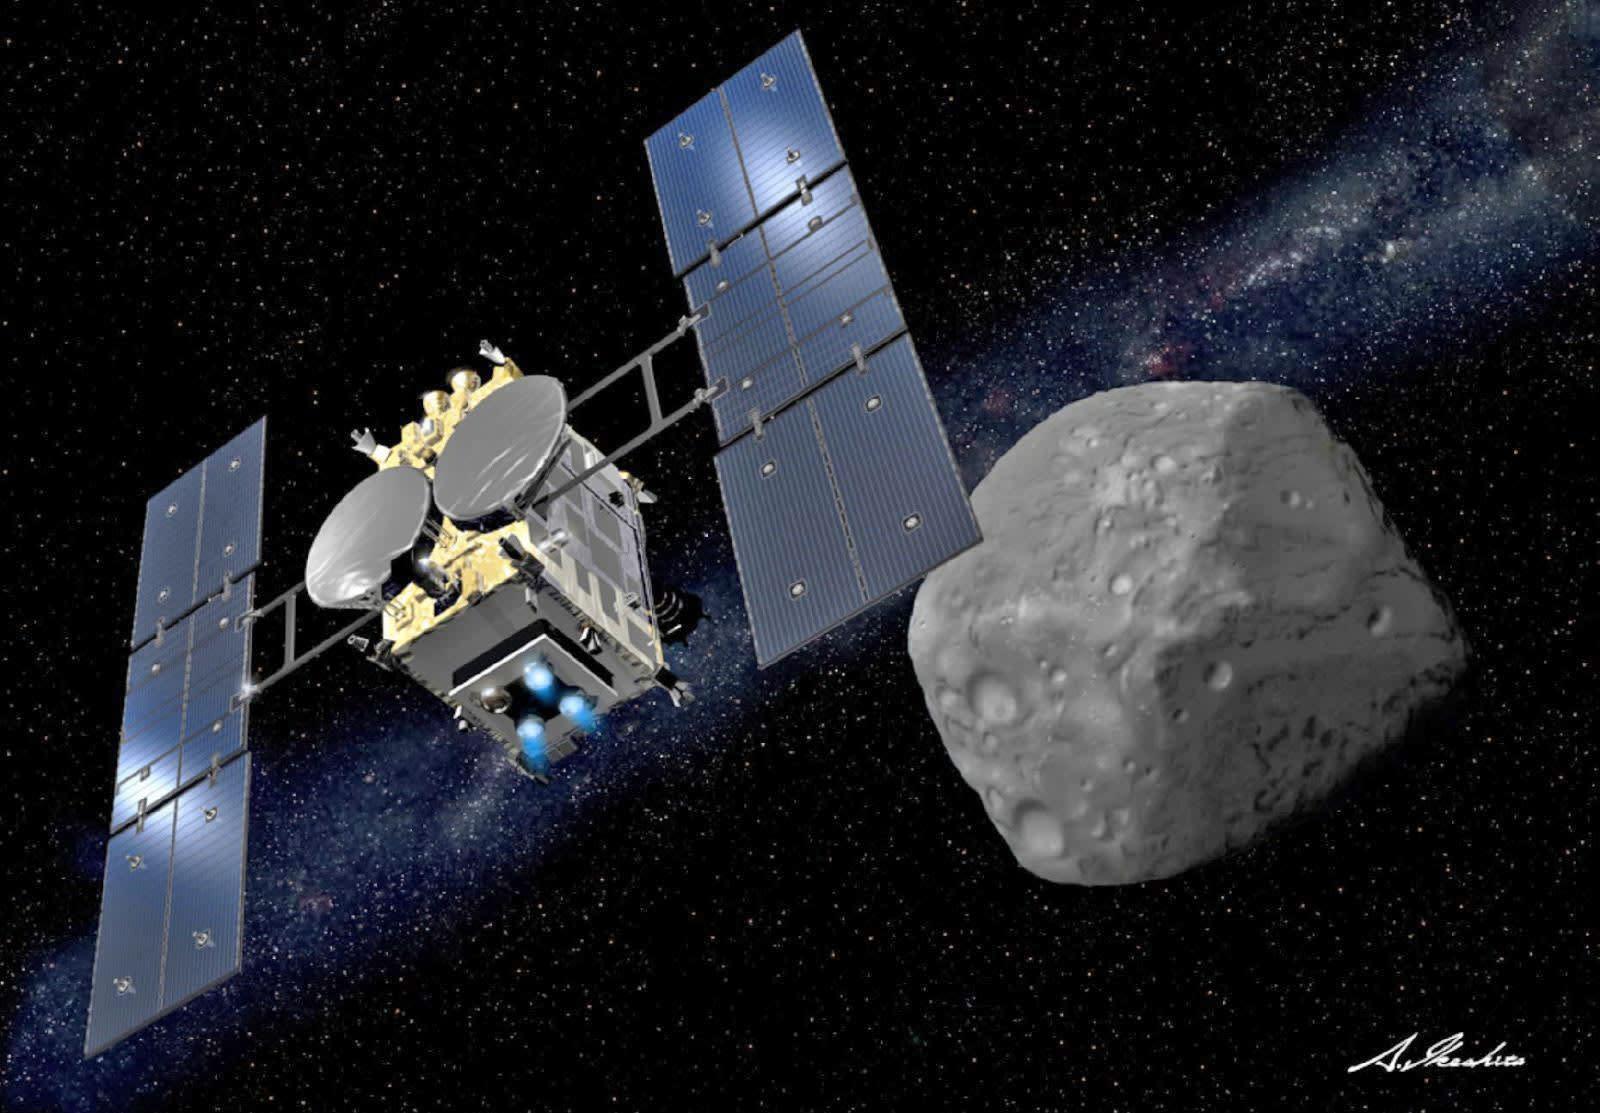 Hayabusa 2 will finally start mining an asteroid on February 22nd | Engadget